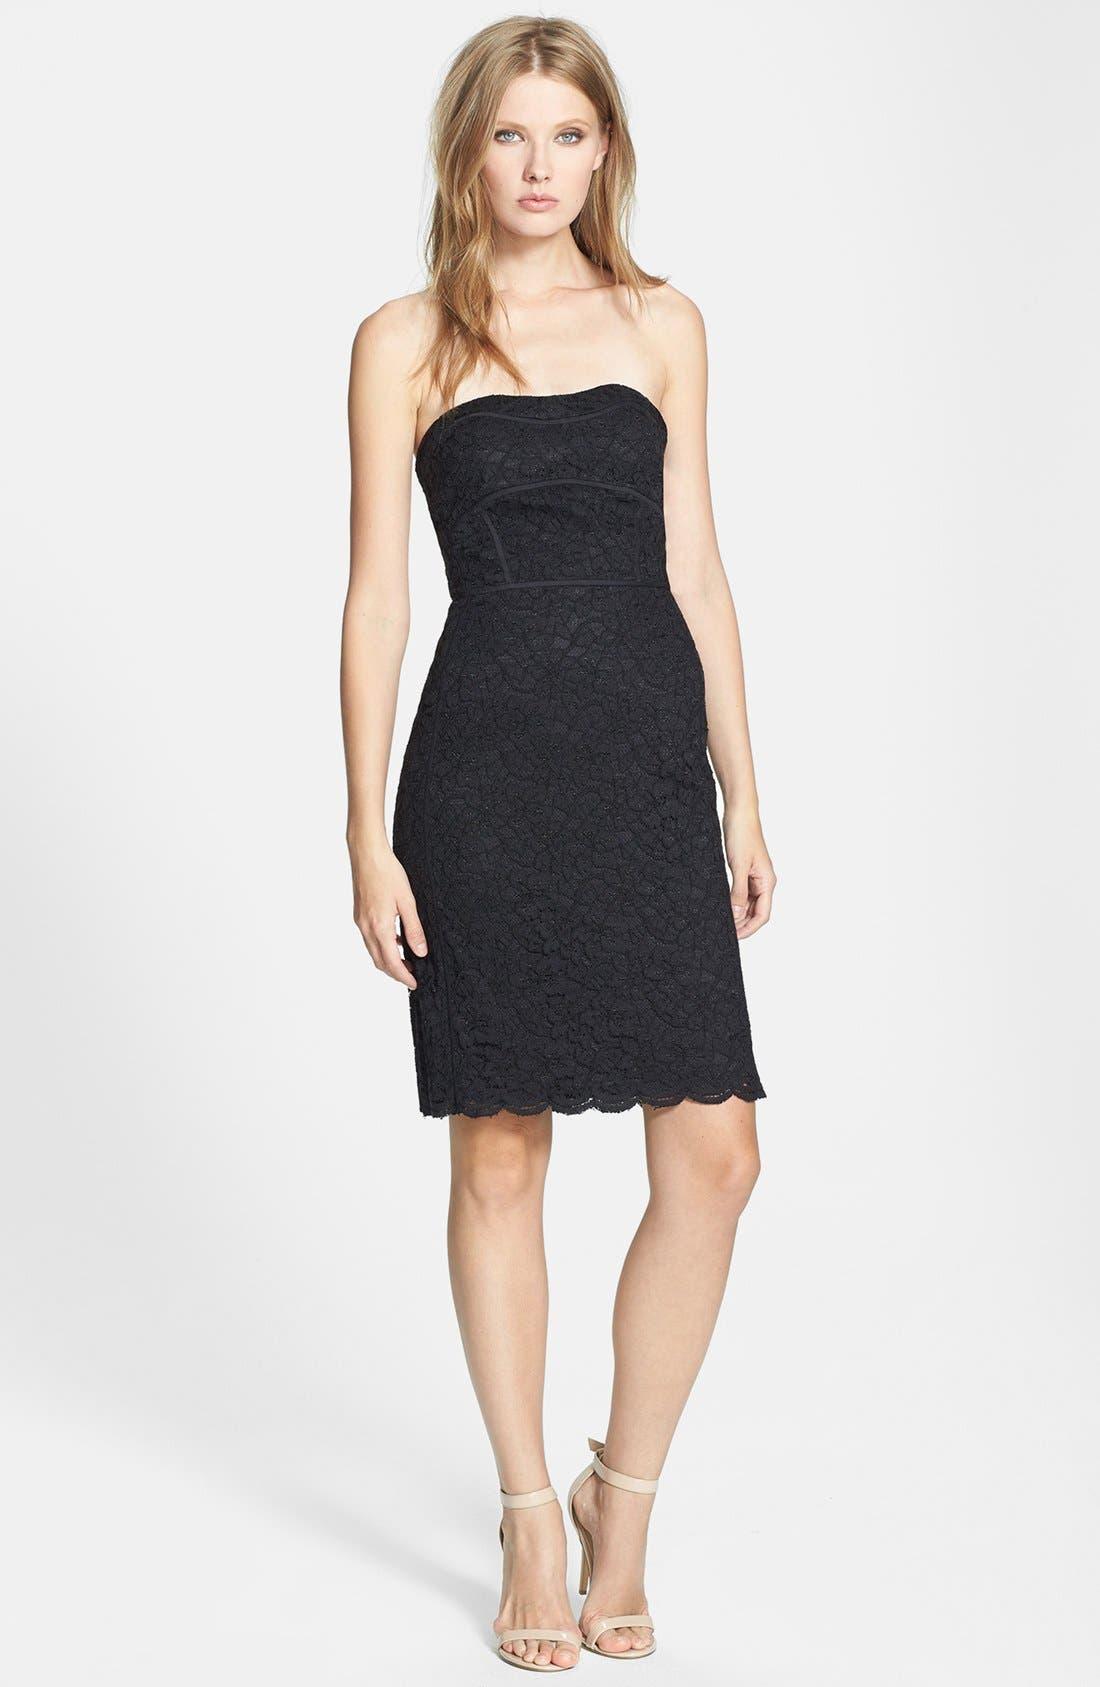 Main Image - Diane von Furstenberg 'Bailey' Piped Lace Strapless Dress